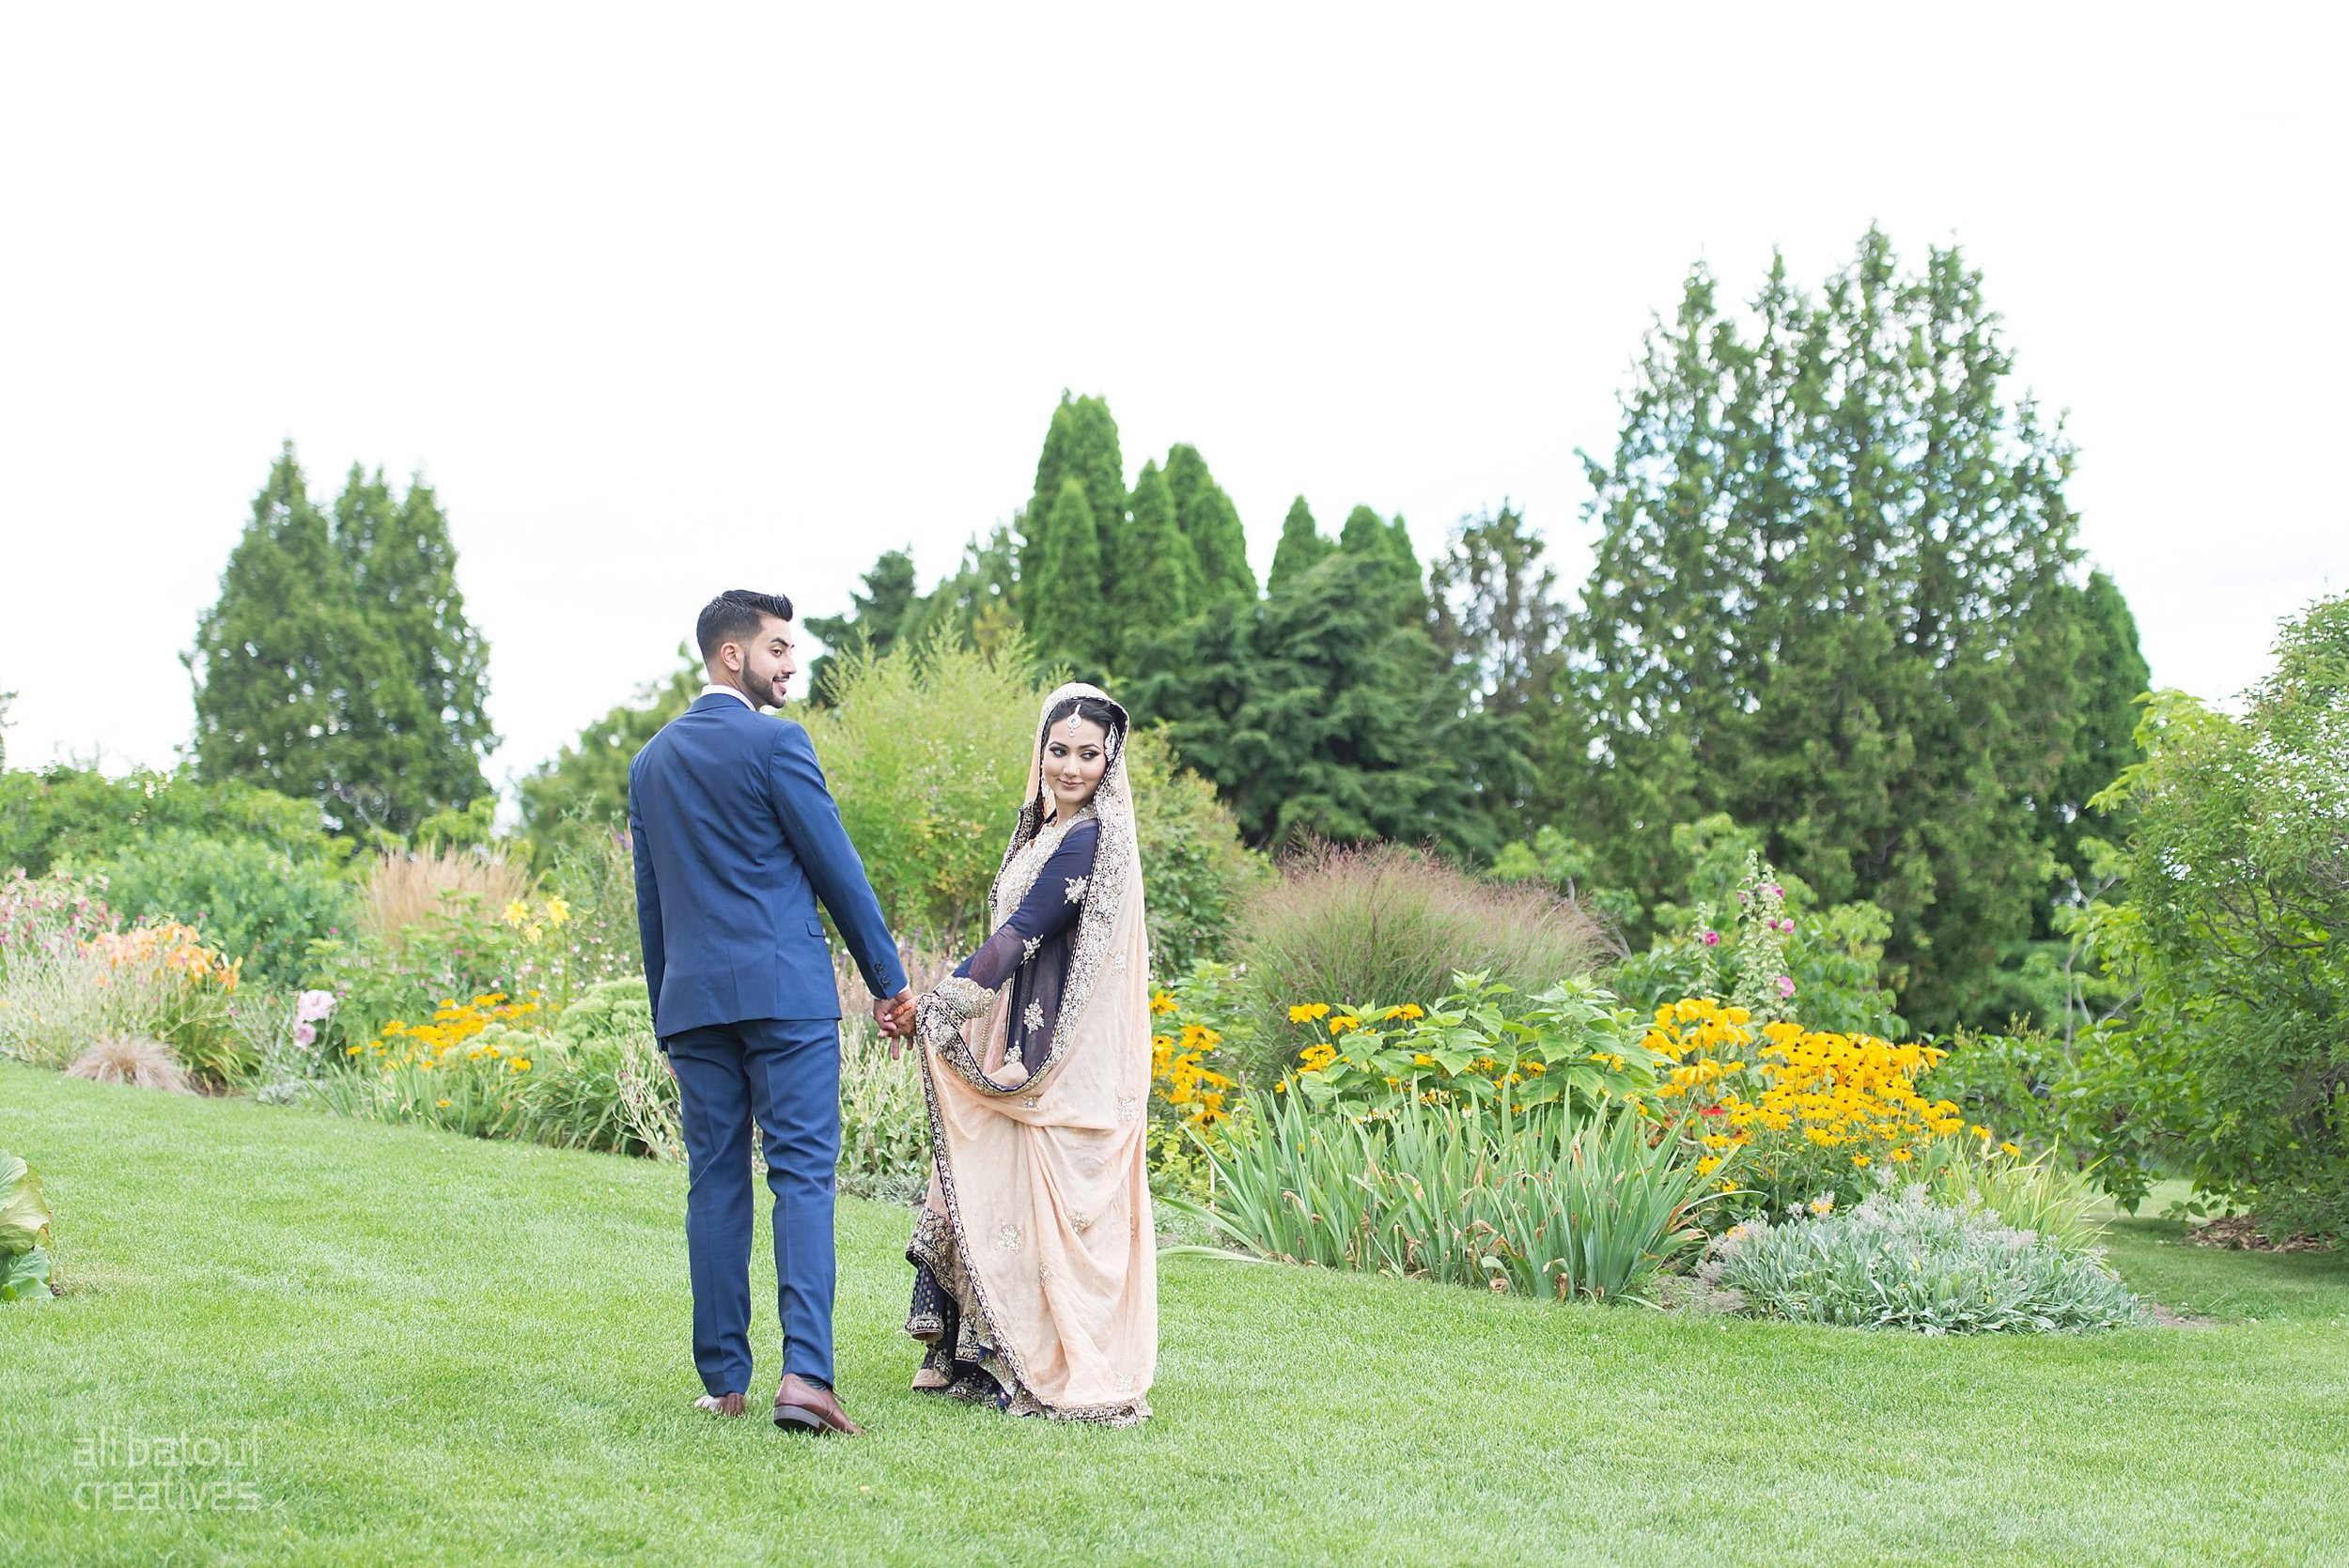 Alina + Mahmood - Ali Batoul Creatives Blog (2)-15_Stomped.jpg